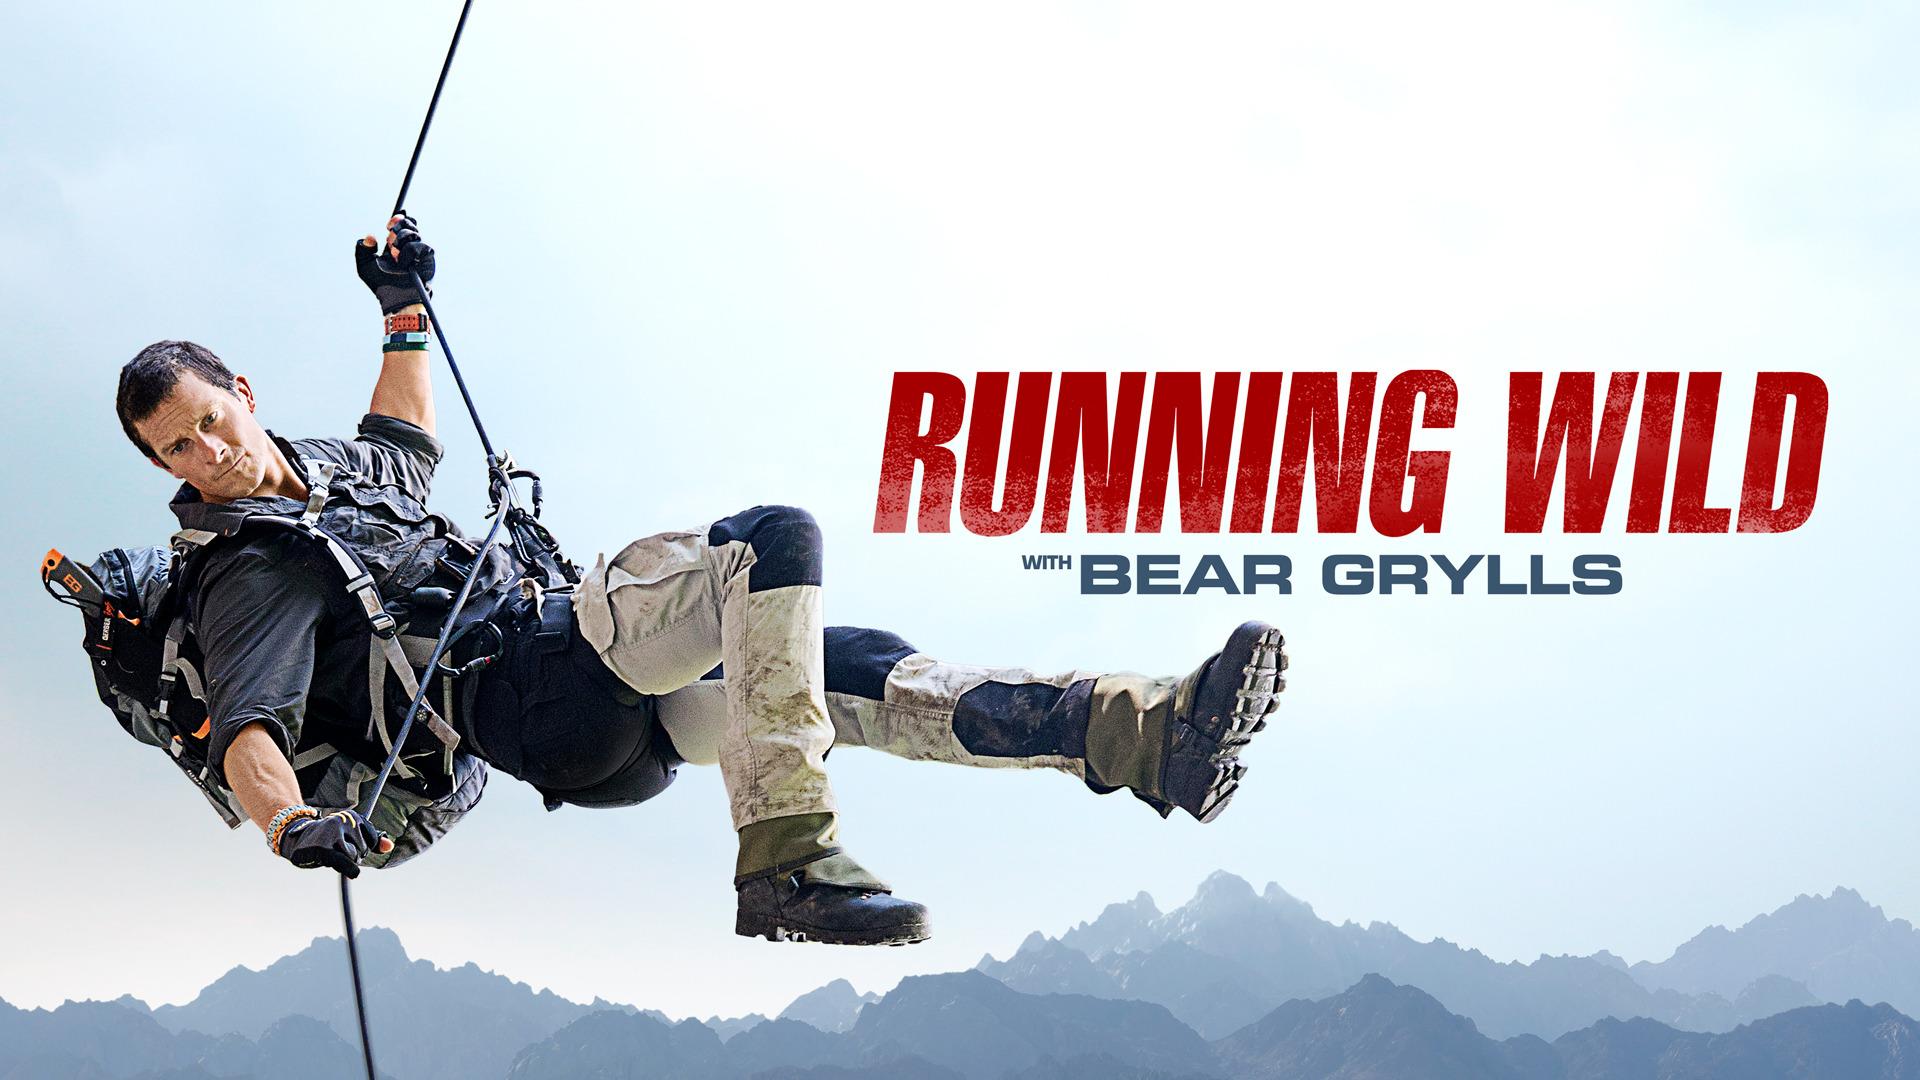 Show Running Wild with Bear Grylls